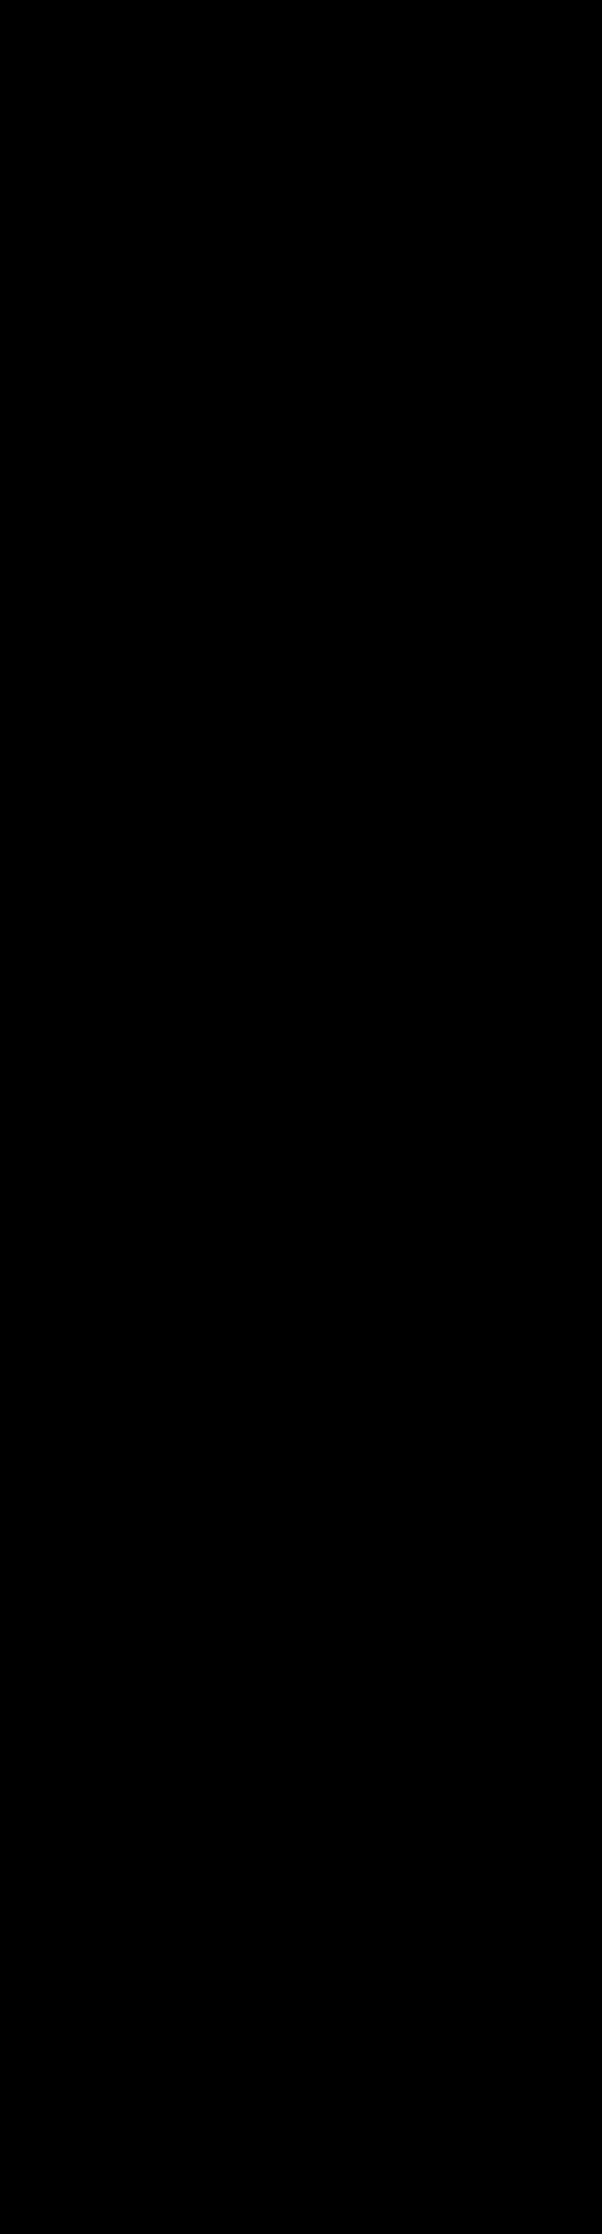 602x2234 Silhouette Of Woman In A Butterflies Dress Stock Vector